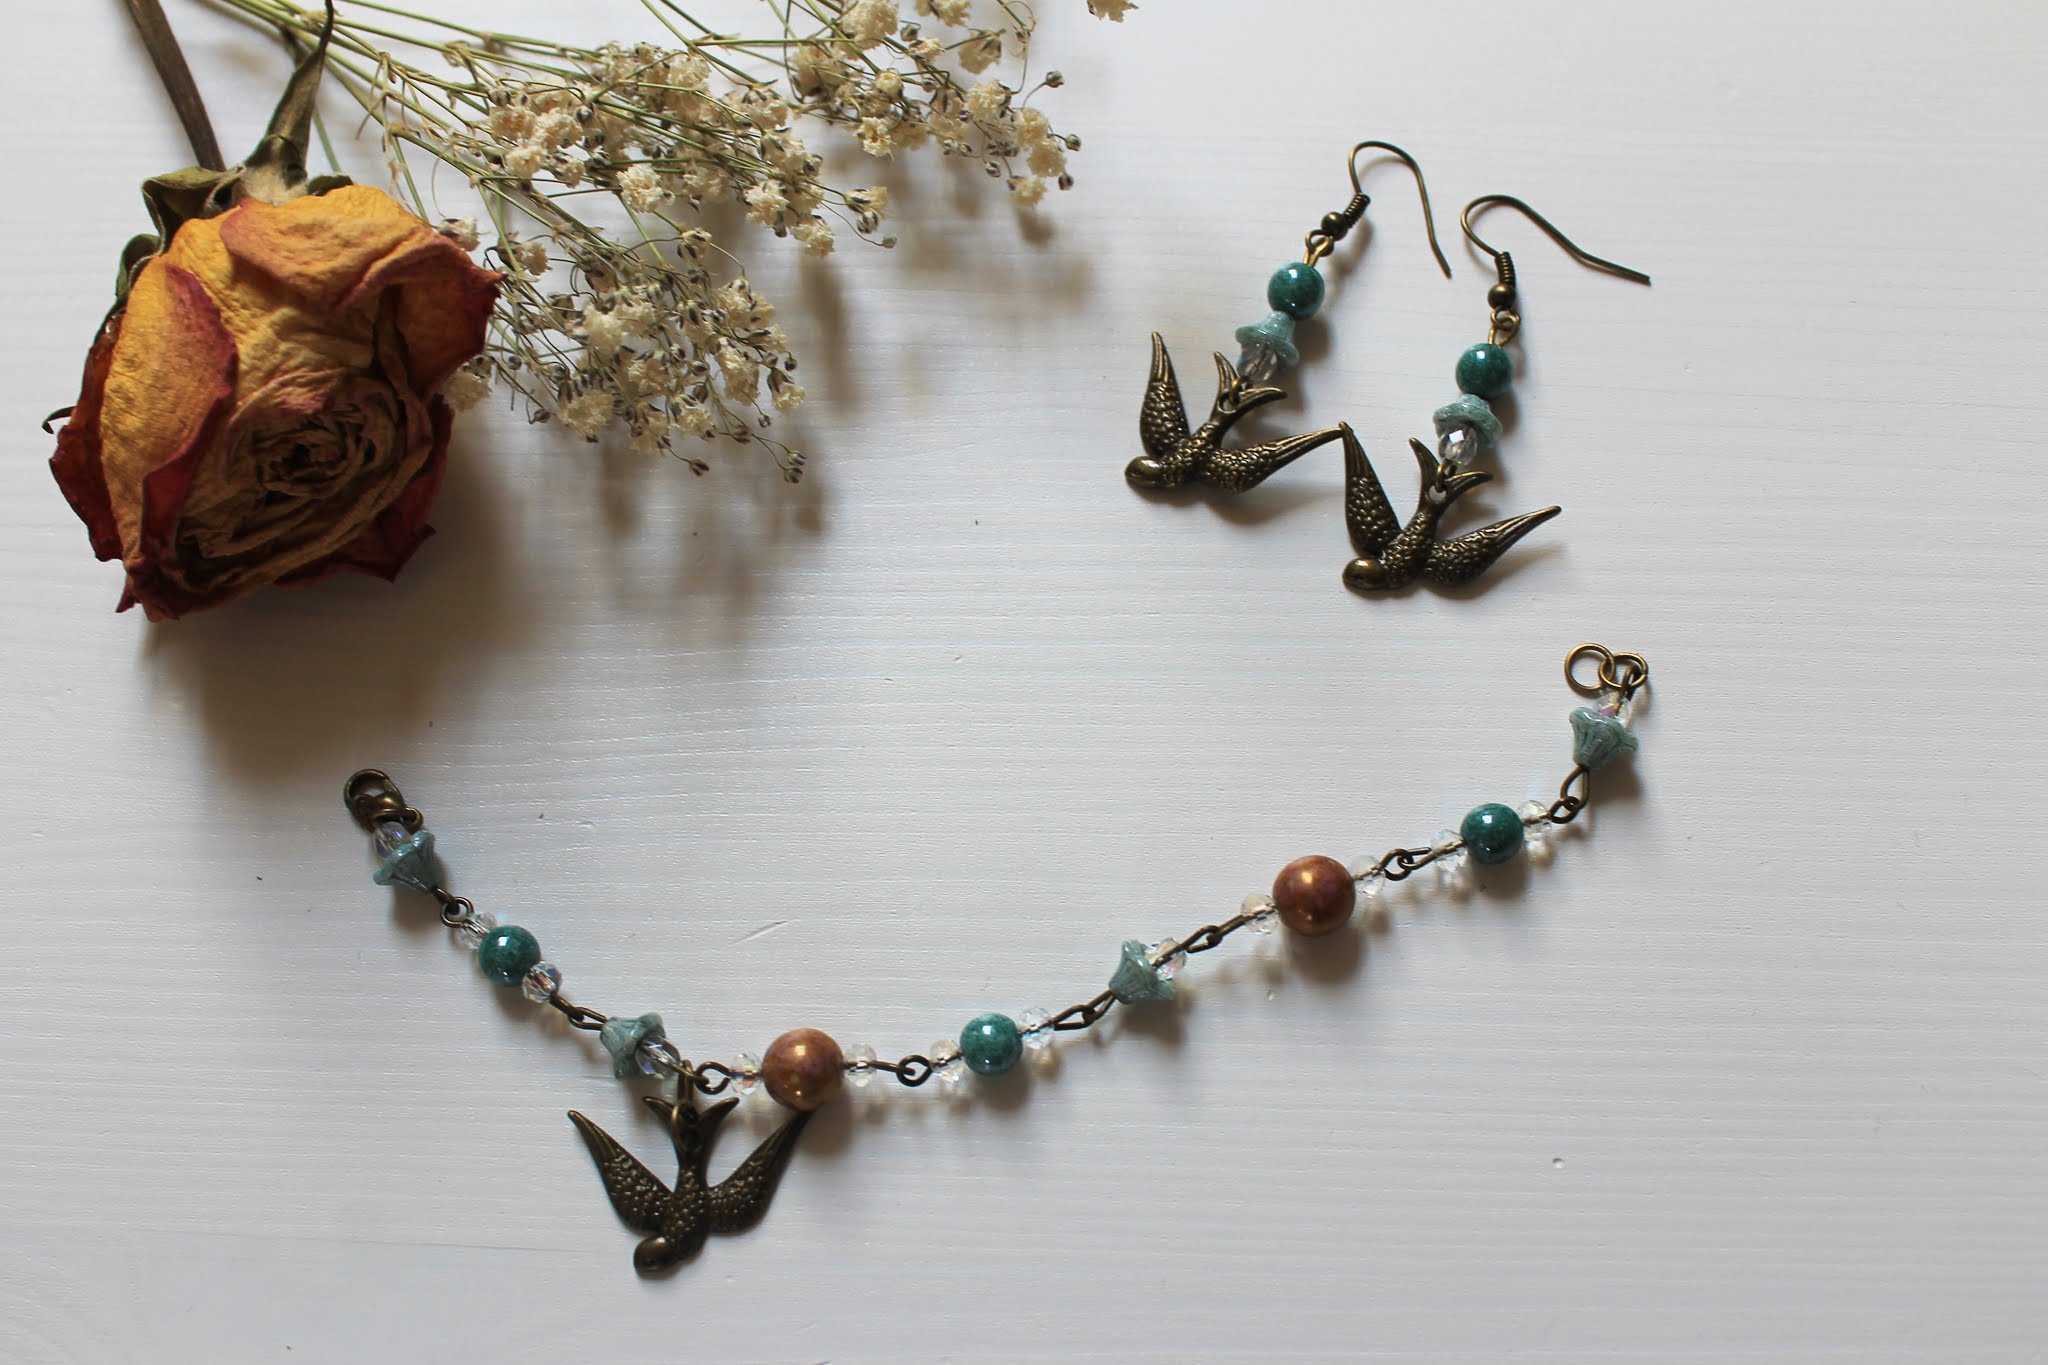 gioielli artigianali The moon creations